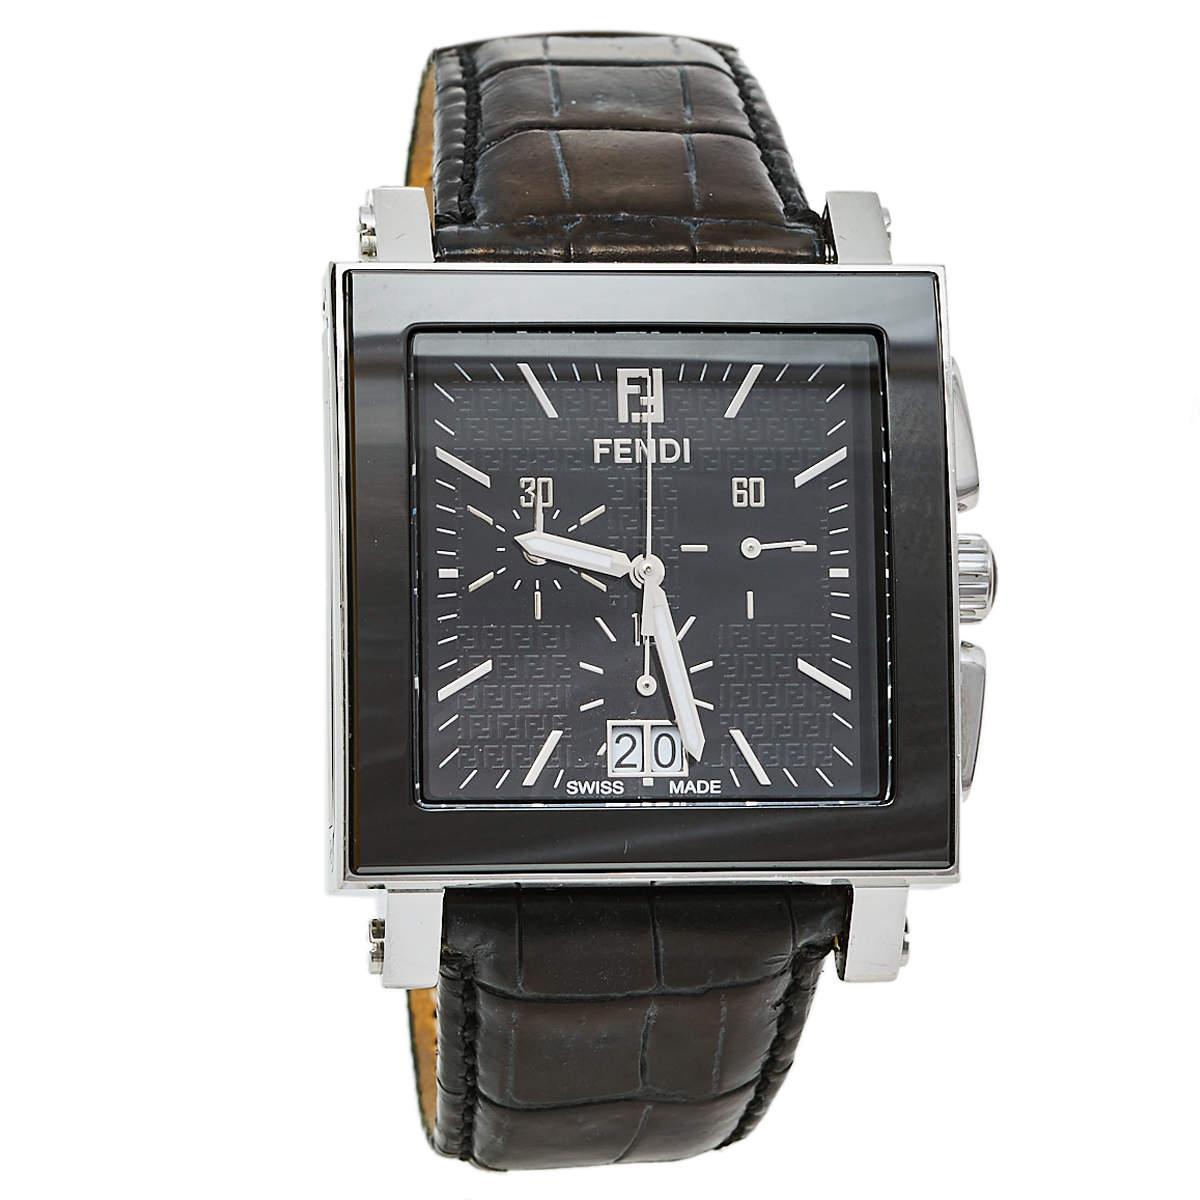 Fendi Black Ceramic Stainless Steel Quadro 6500G Men's Wristwatch 39 mm